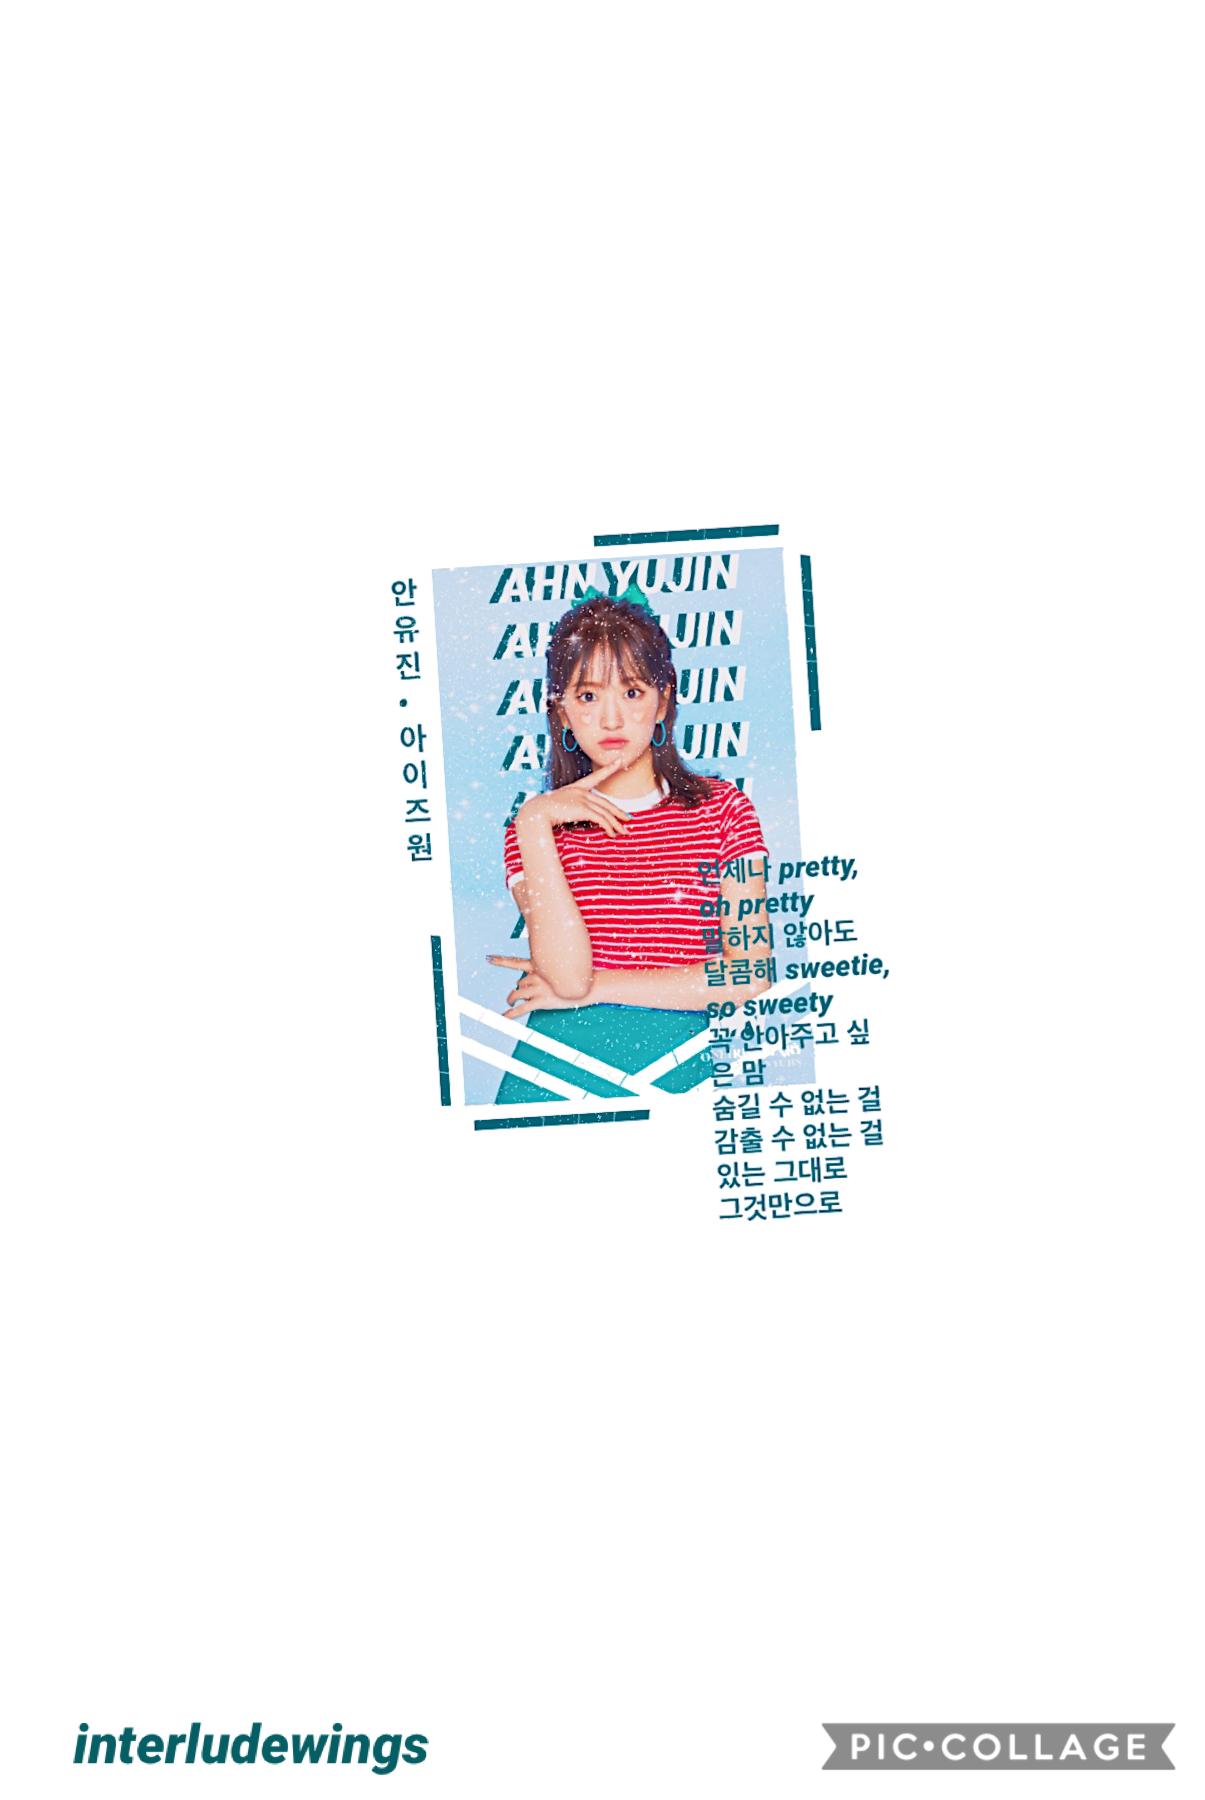 ❤️ open ❤️ yujin~izone  idk how i feel abt this edit but izone's mini album slaps! my favorite tracks are pretty and merry go round 🥰